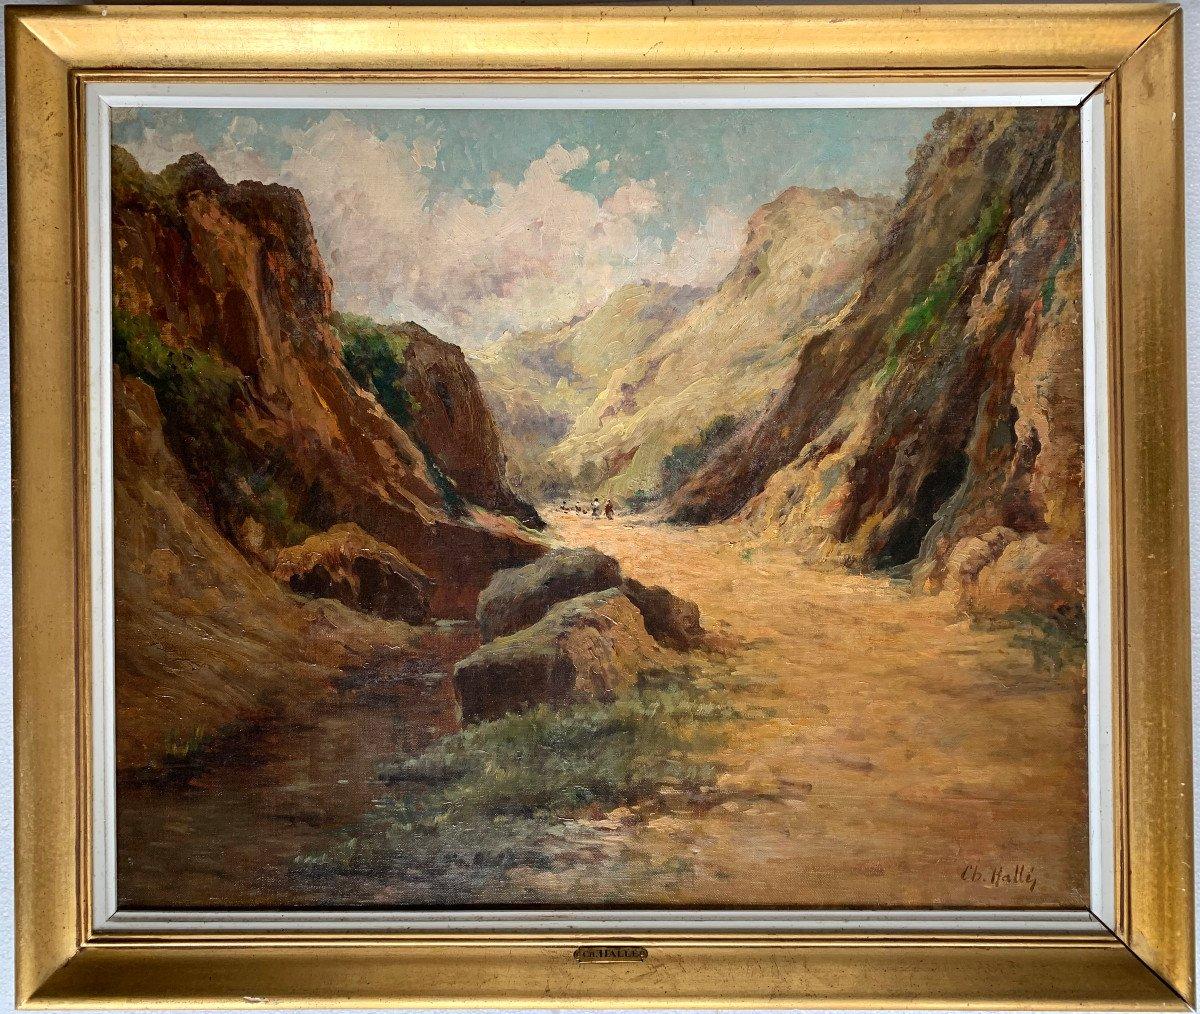 Charles Hallé (1867-1924) - Crozant School - Animated Landscape - Oil On Canvas-photo-2